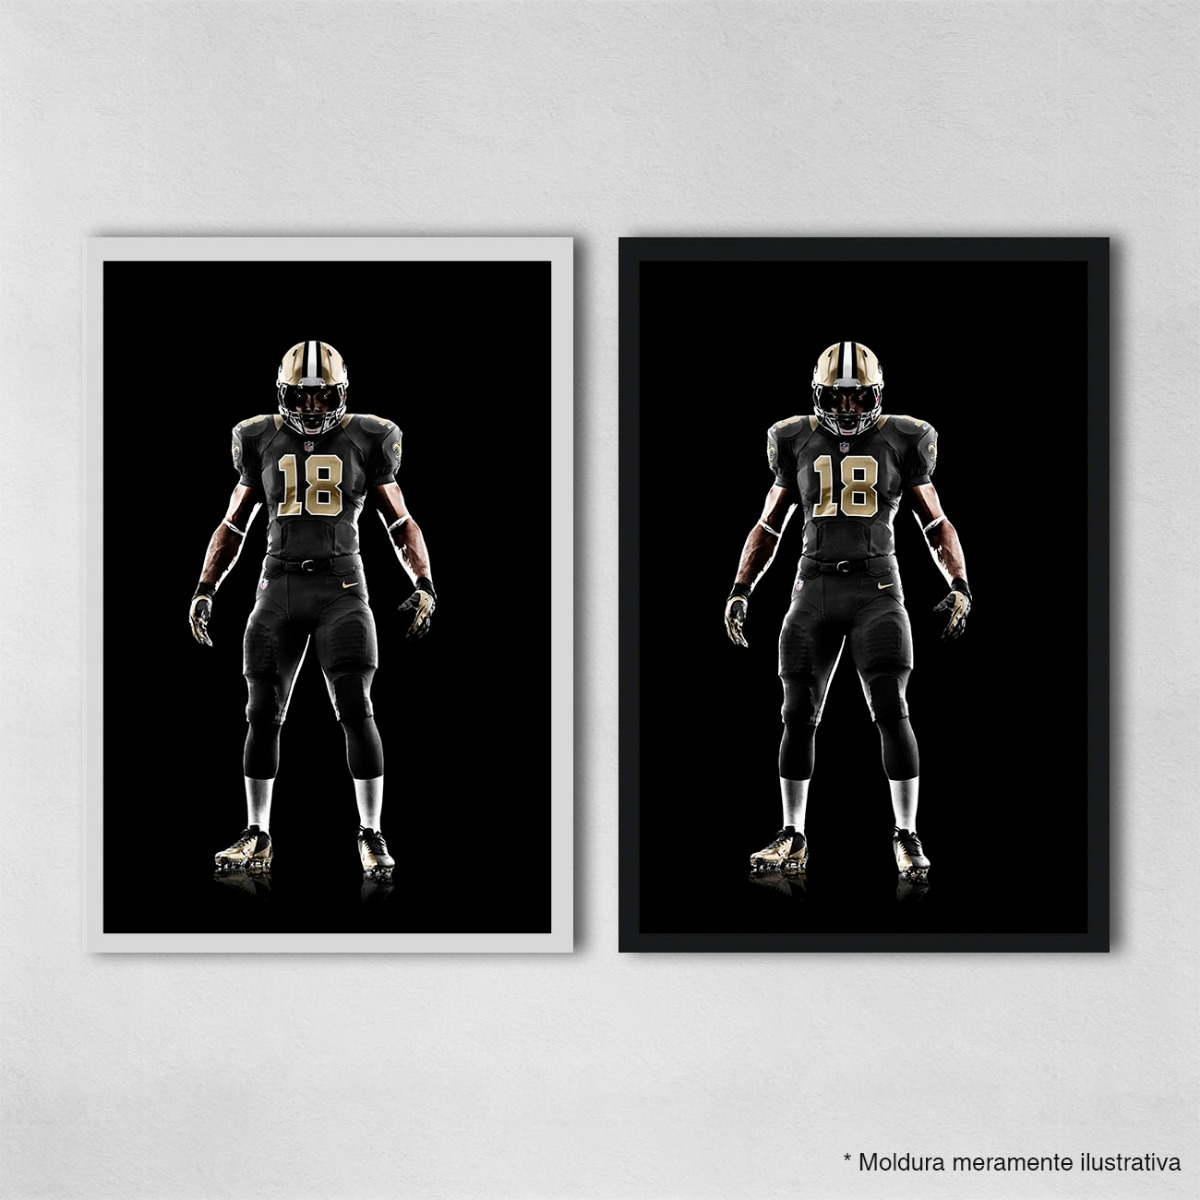 59b5a8760 poster 30x45cm futebol americano nfl new orleans saints 47. Carregando zoom.